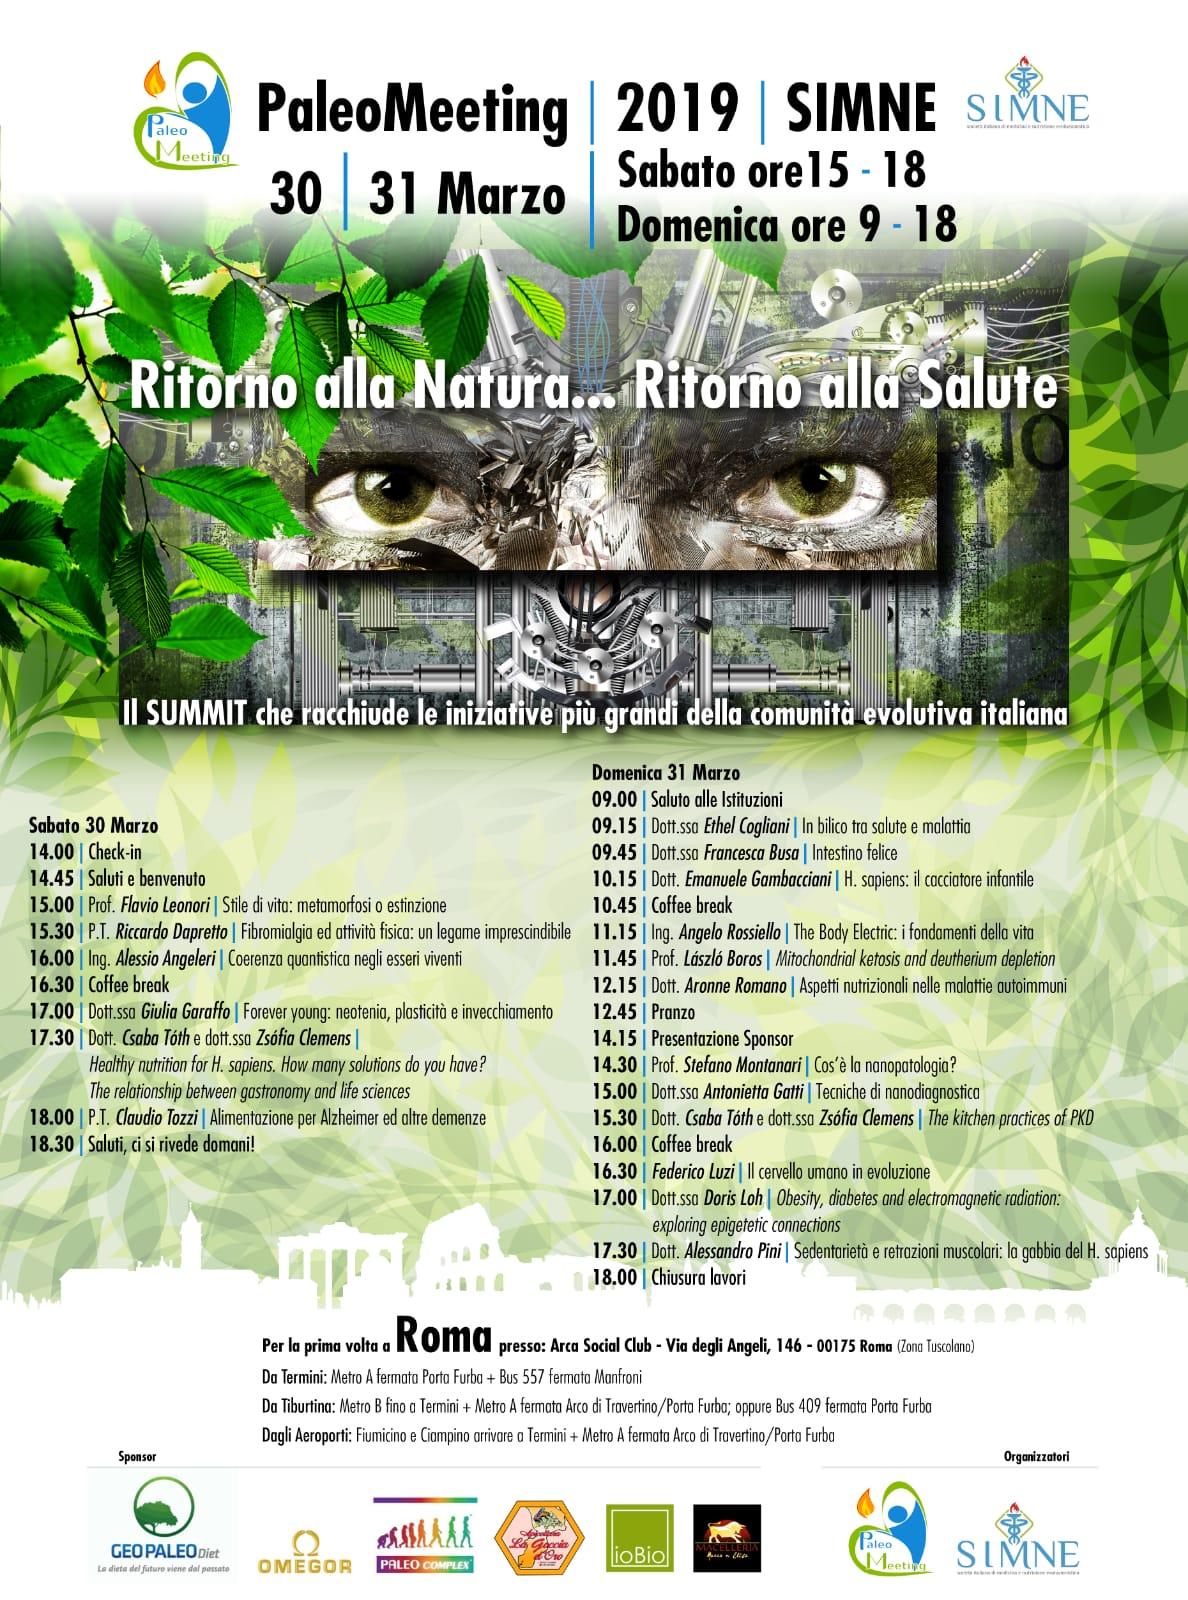 Locandina PaleoMeeting + SIMNE con Programma Provvisorio